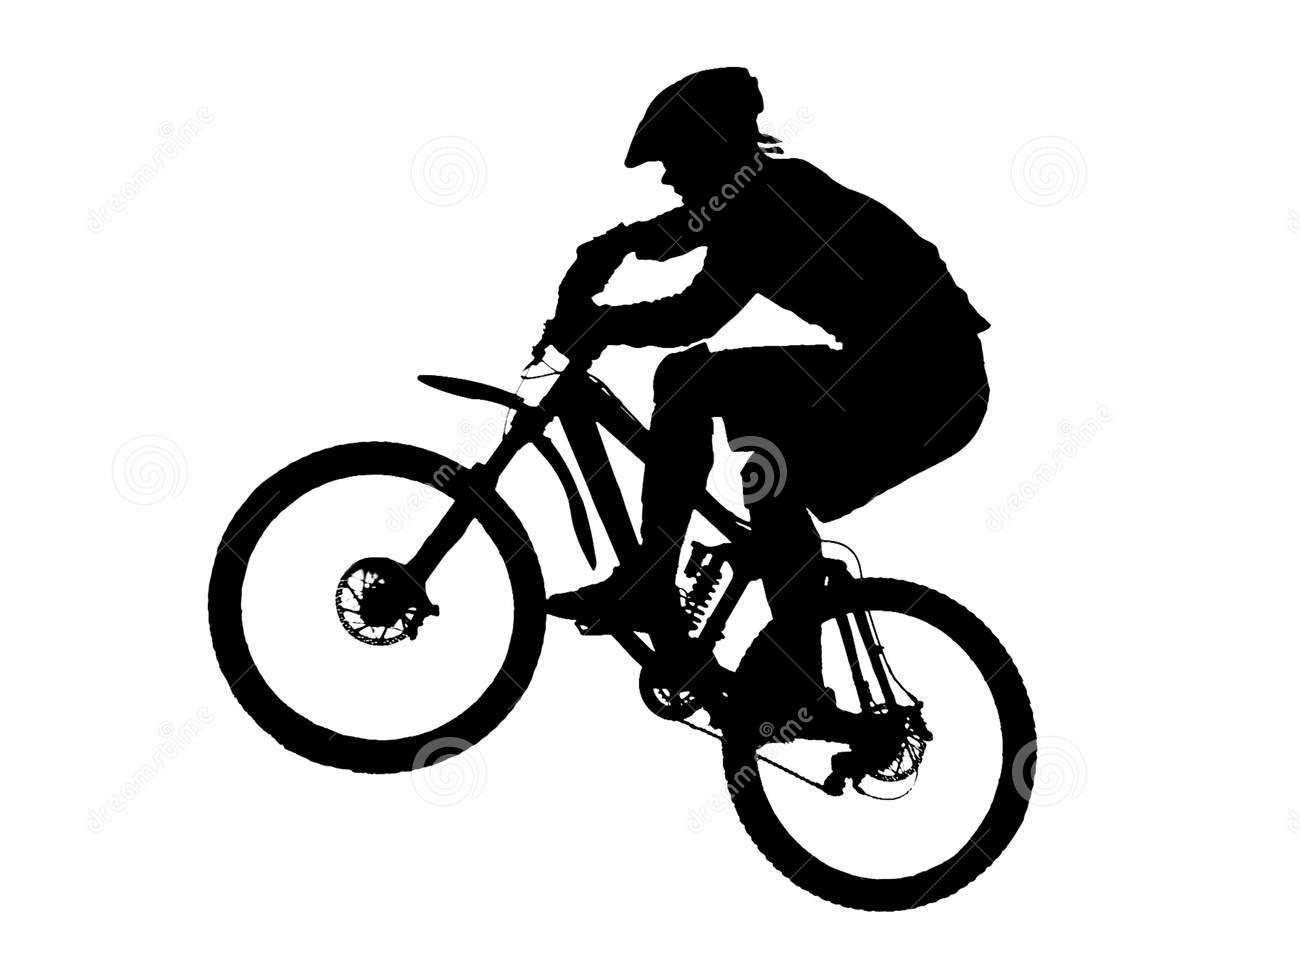 mountain bike clip art - Google Search | Bike Stuff ...